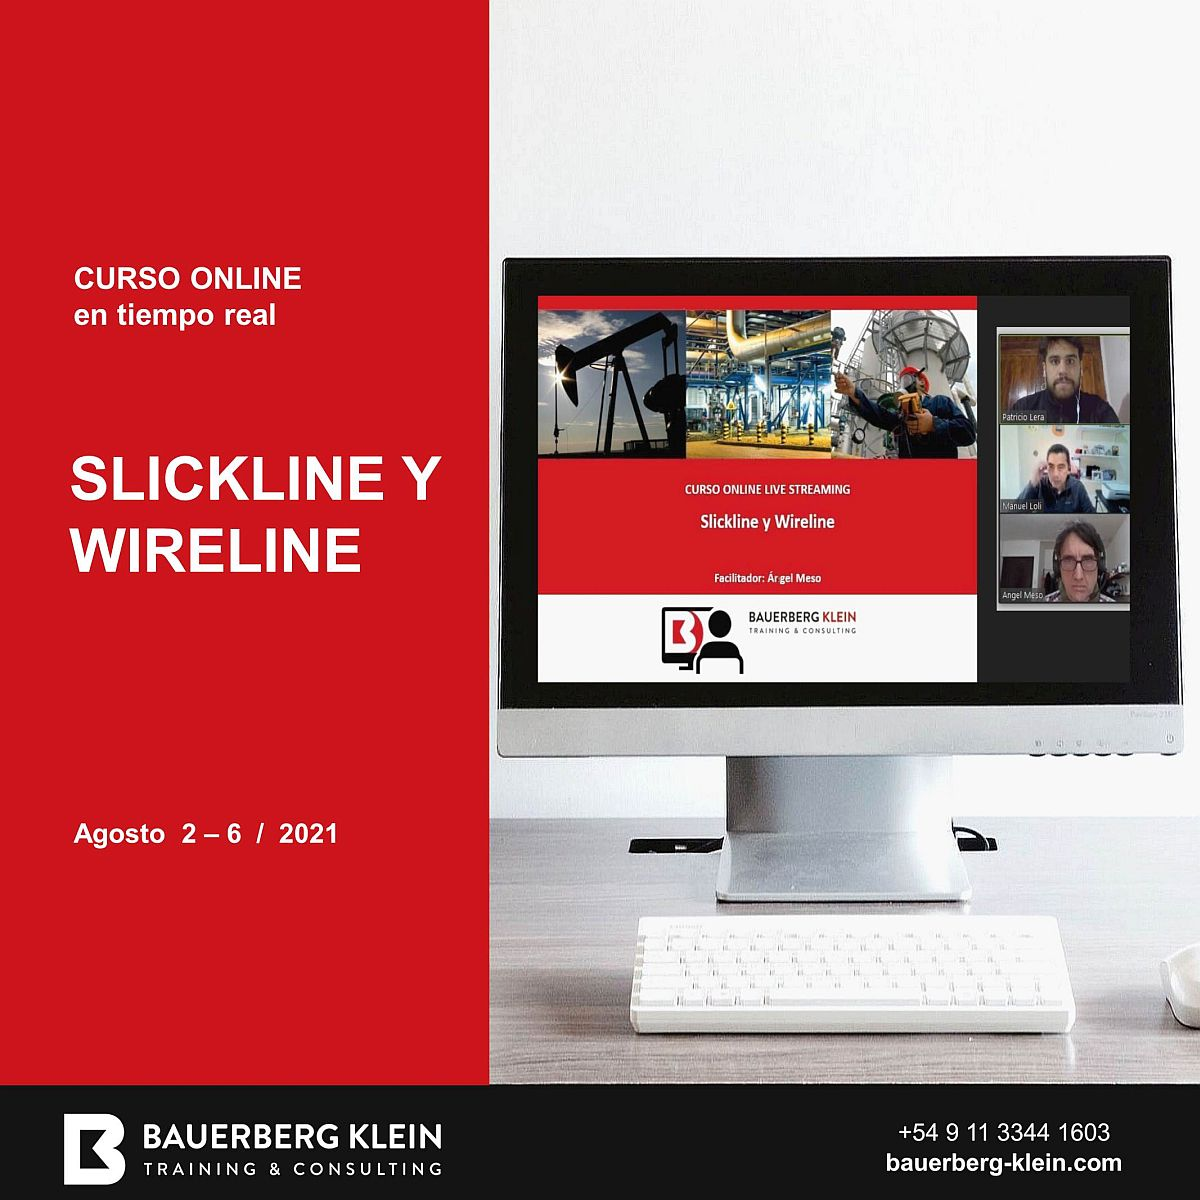 Sickline y Wireline